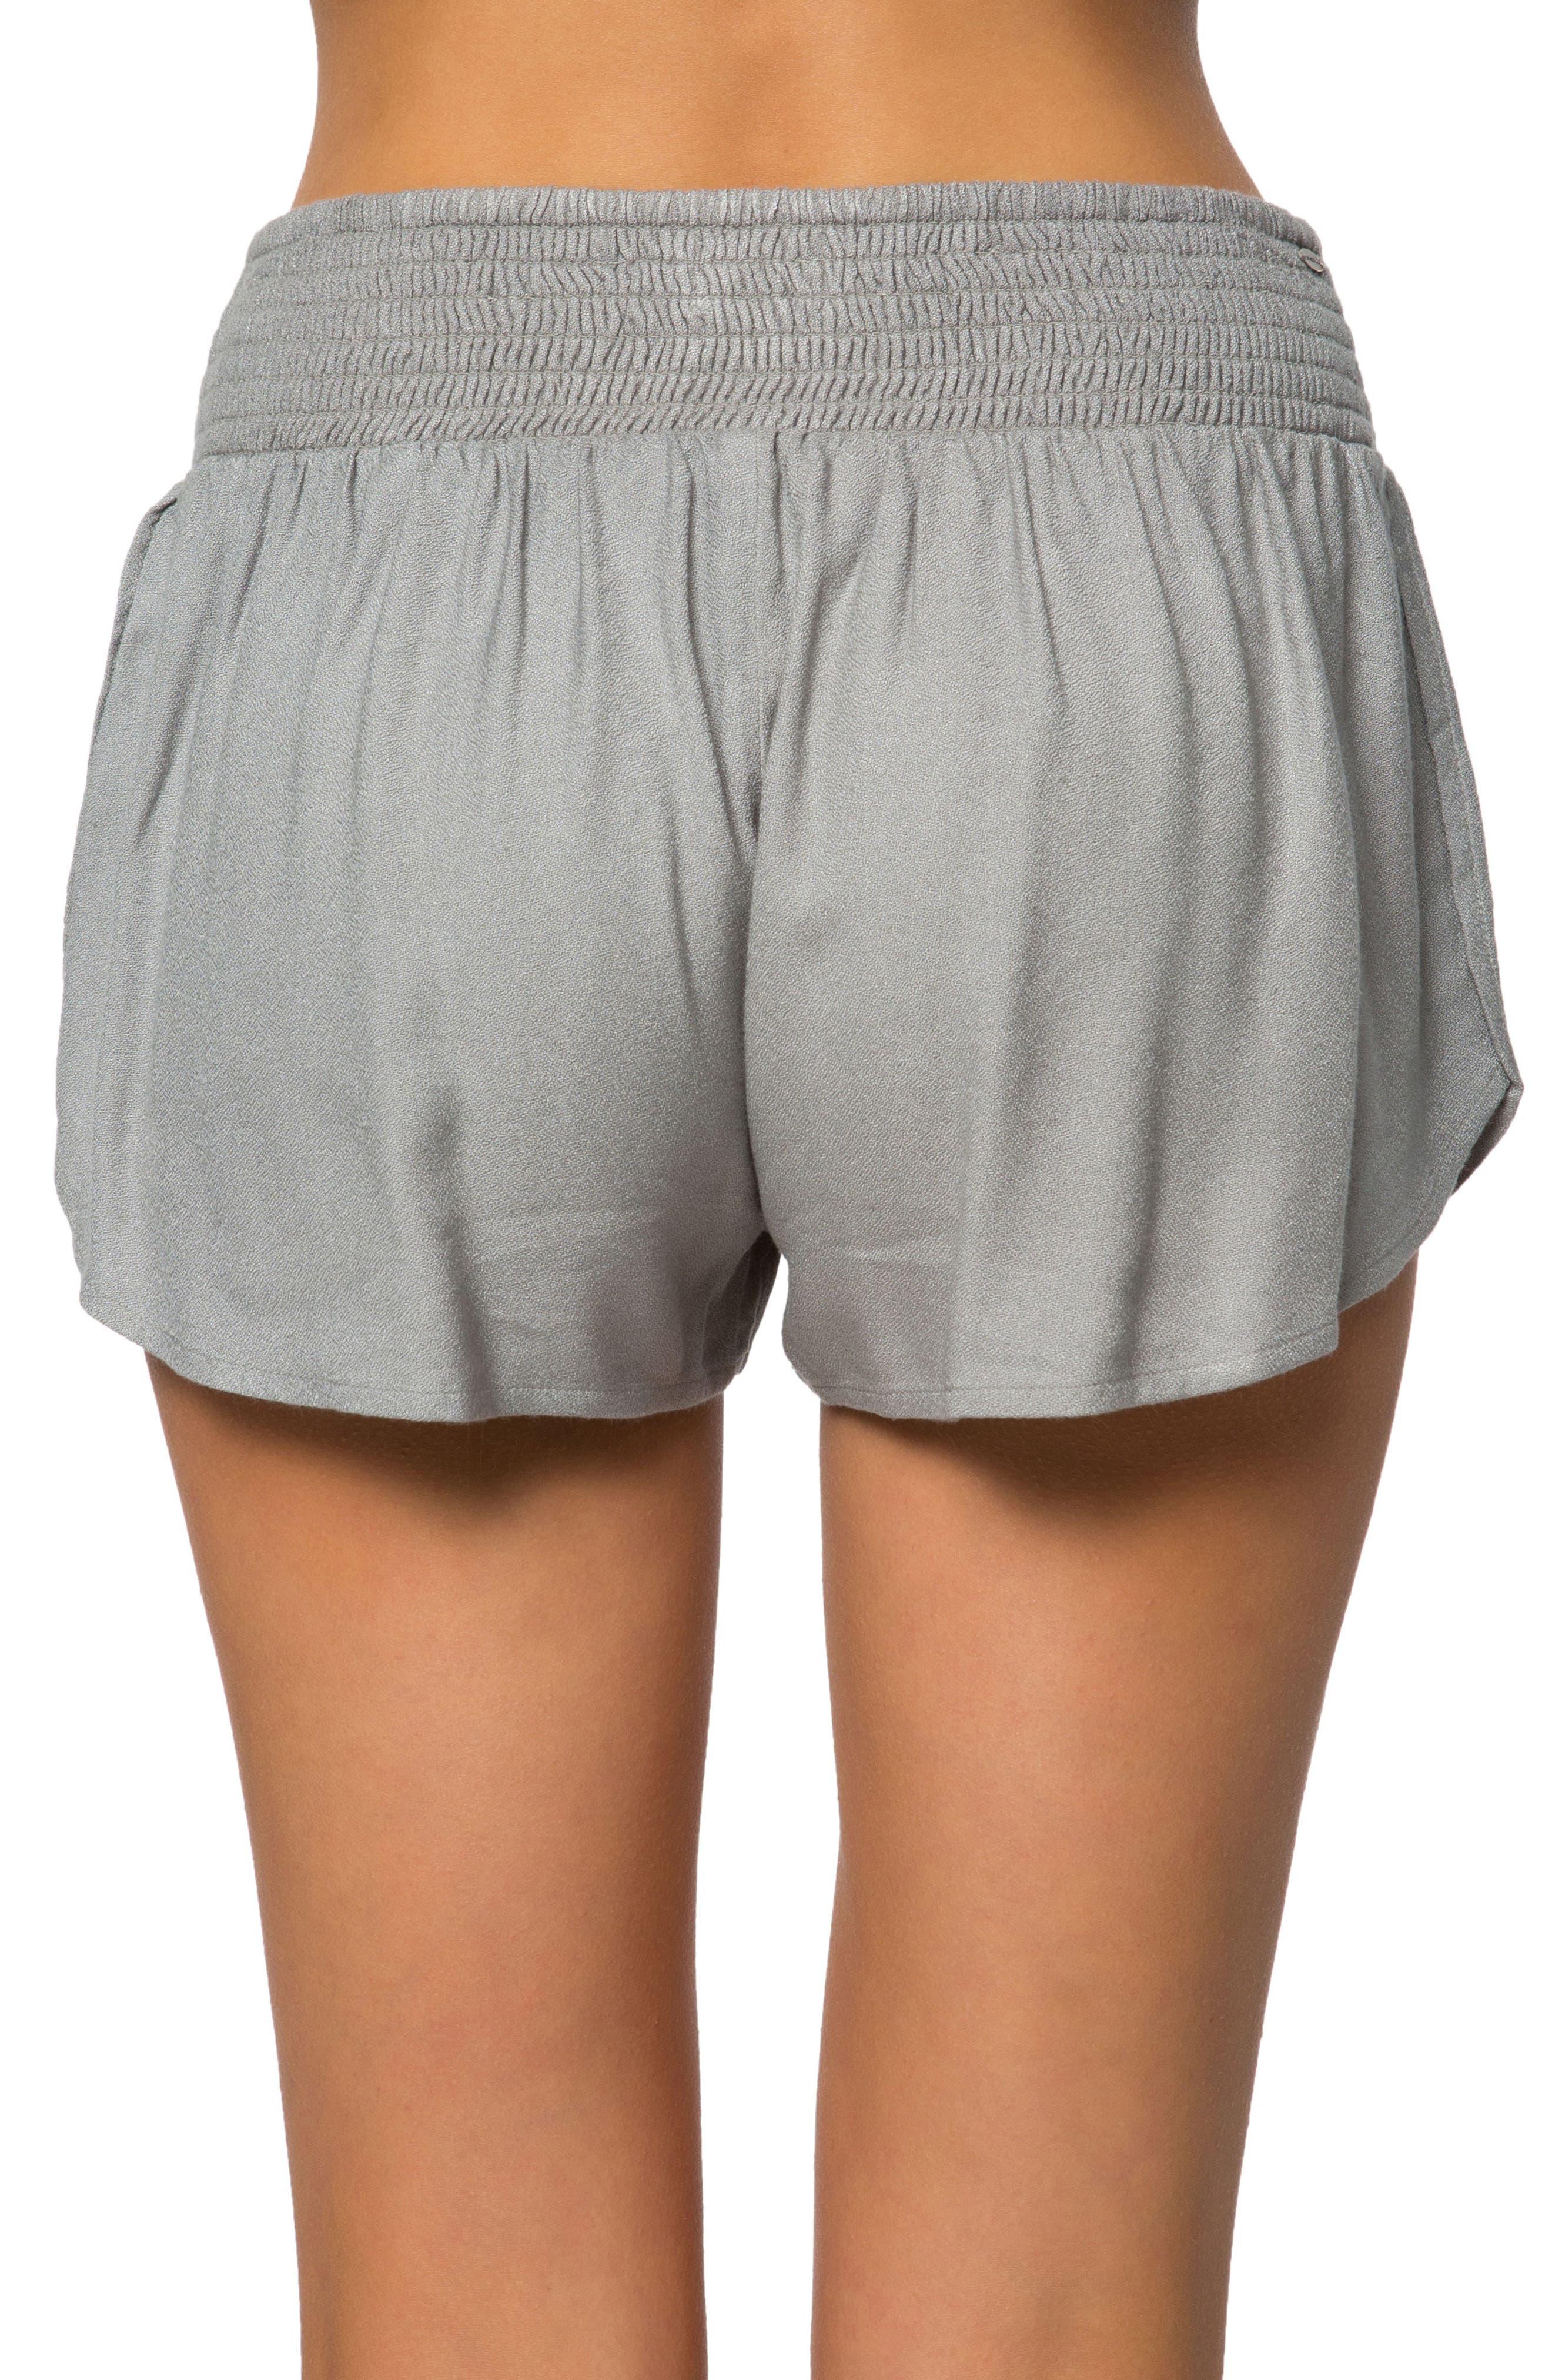 Maui Beach Shorts,                             Alternate thumbnail 2, color,                             Grey